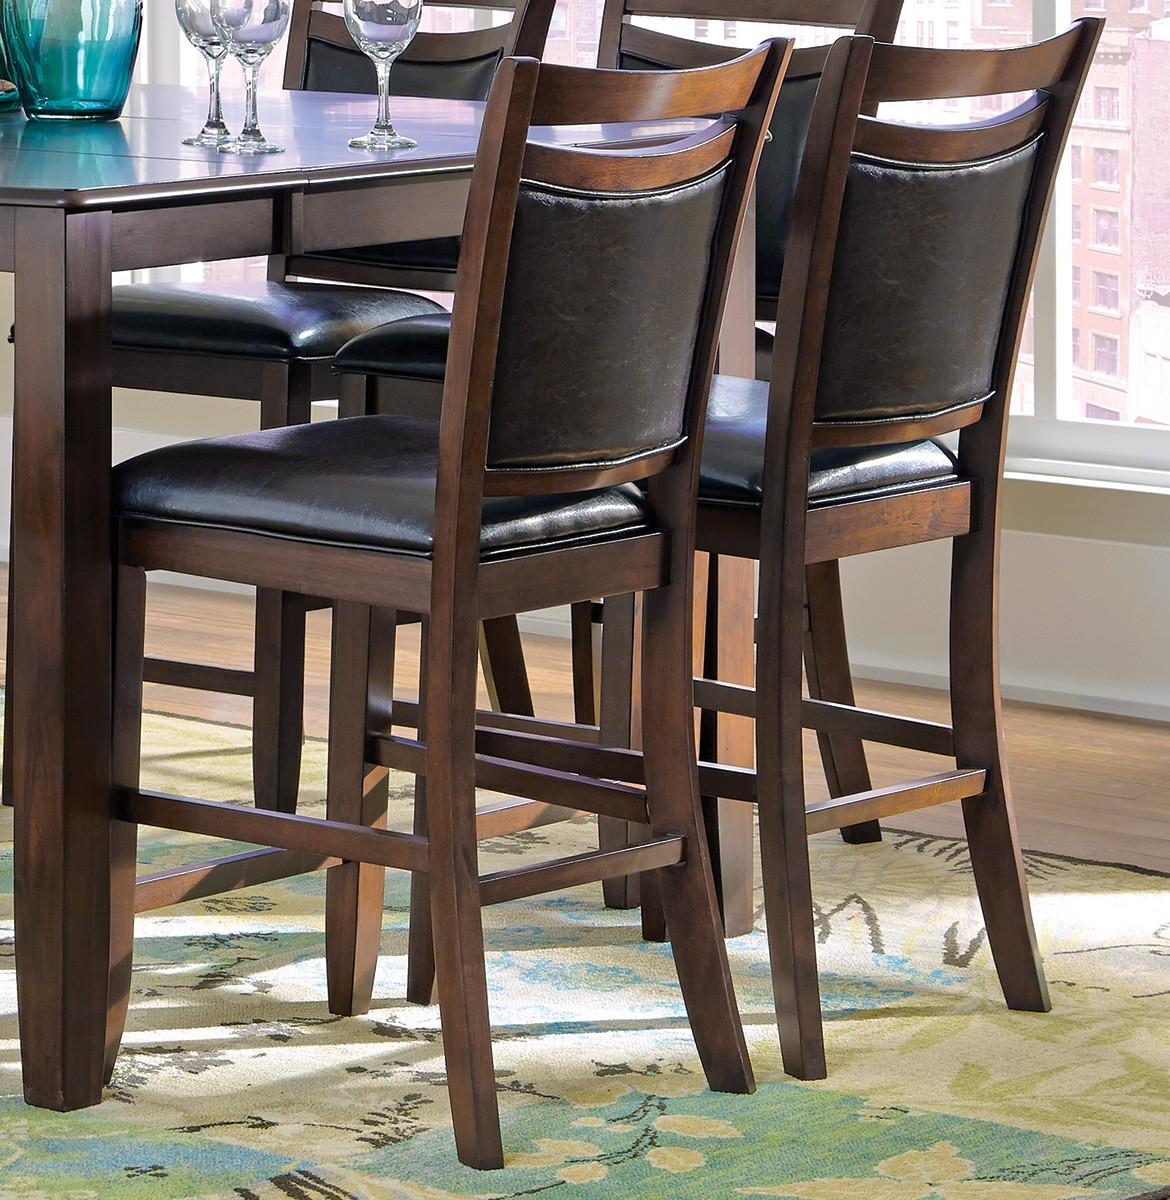 Coaster Dupree Counter Height Chair - Dark Brown